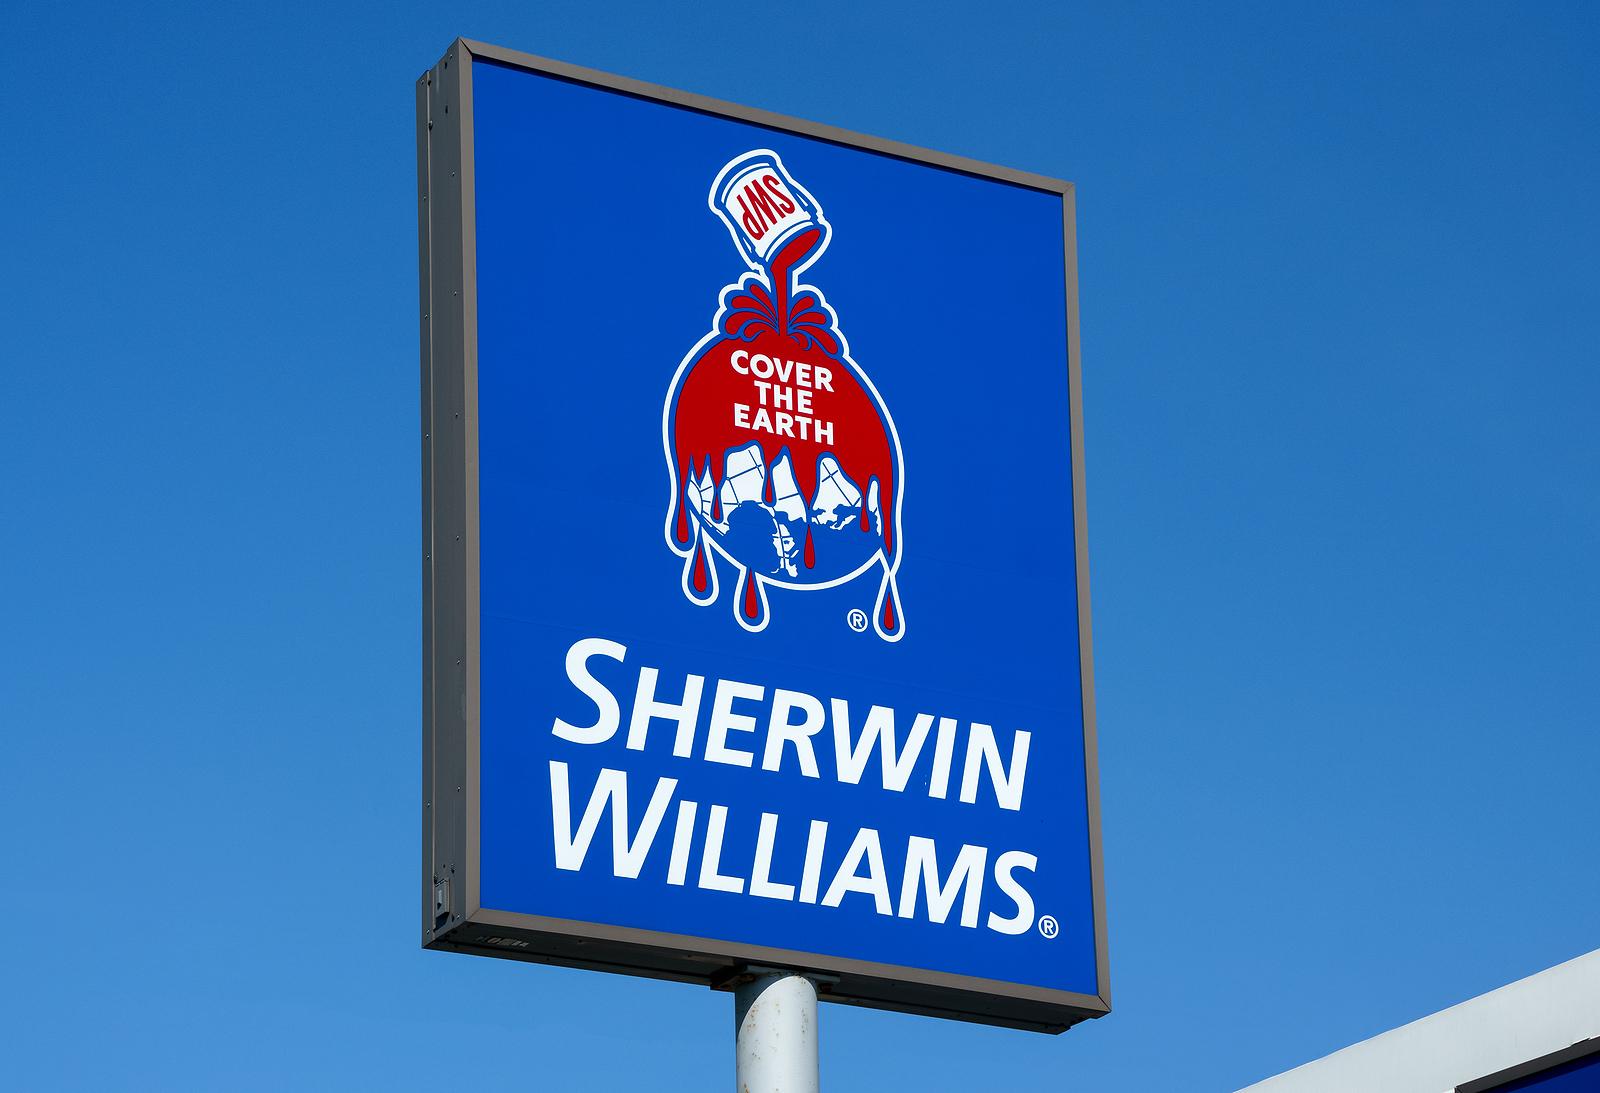 Sherwin Williams stock, SHW stock, SHW stock news